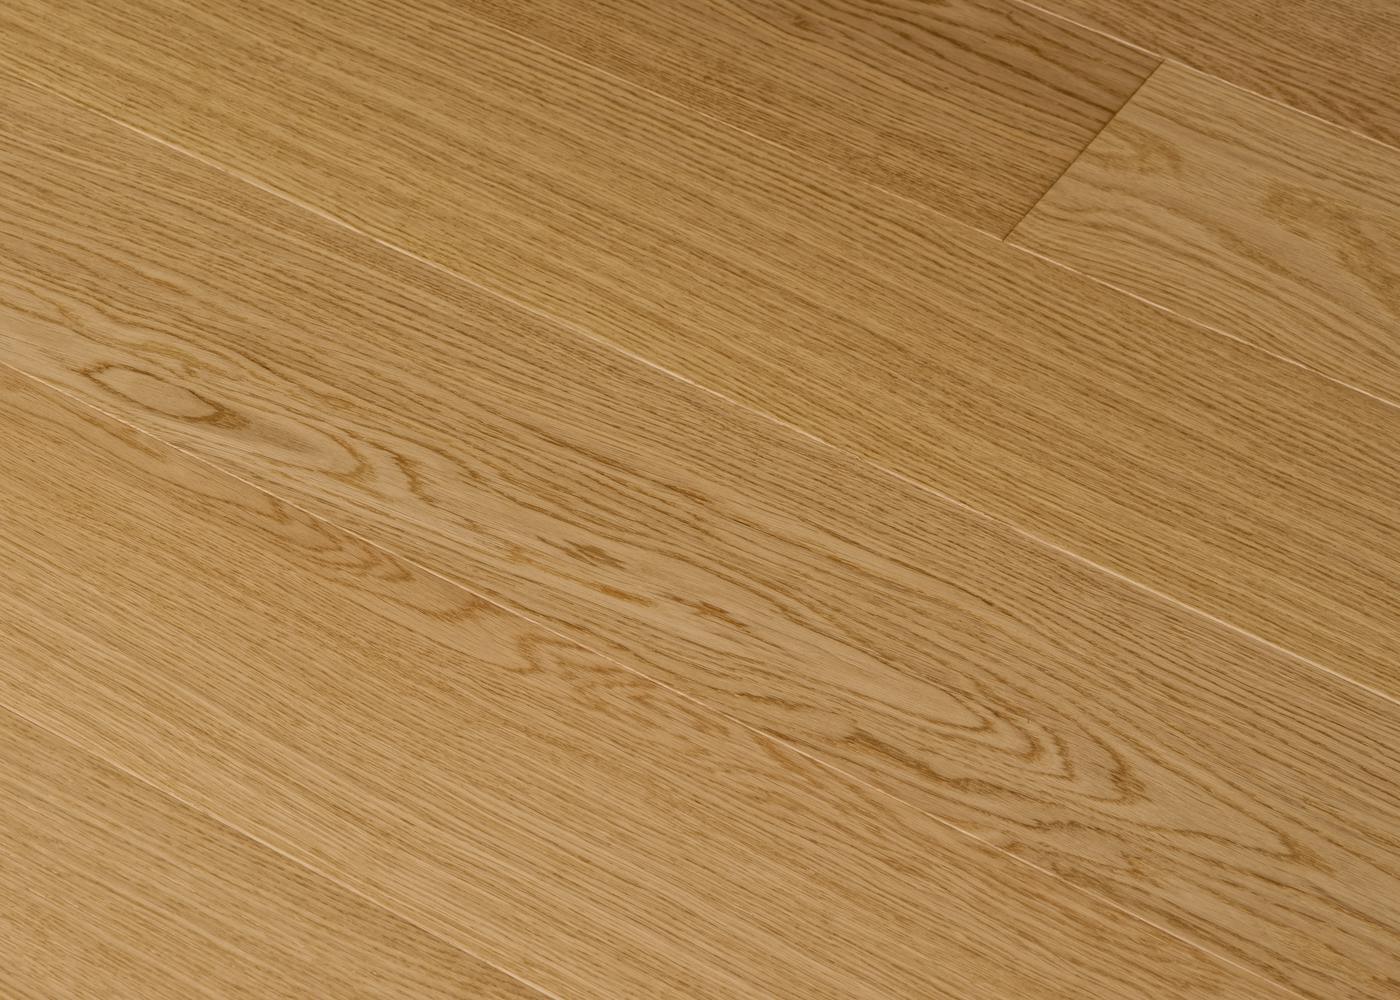 Parquet chêne contrecollé LIVOURNE brossé huile UV Select support HDF 10x92x1420